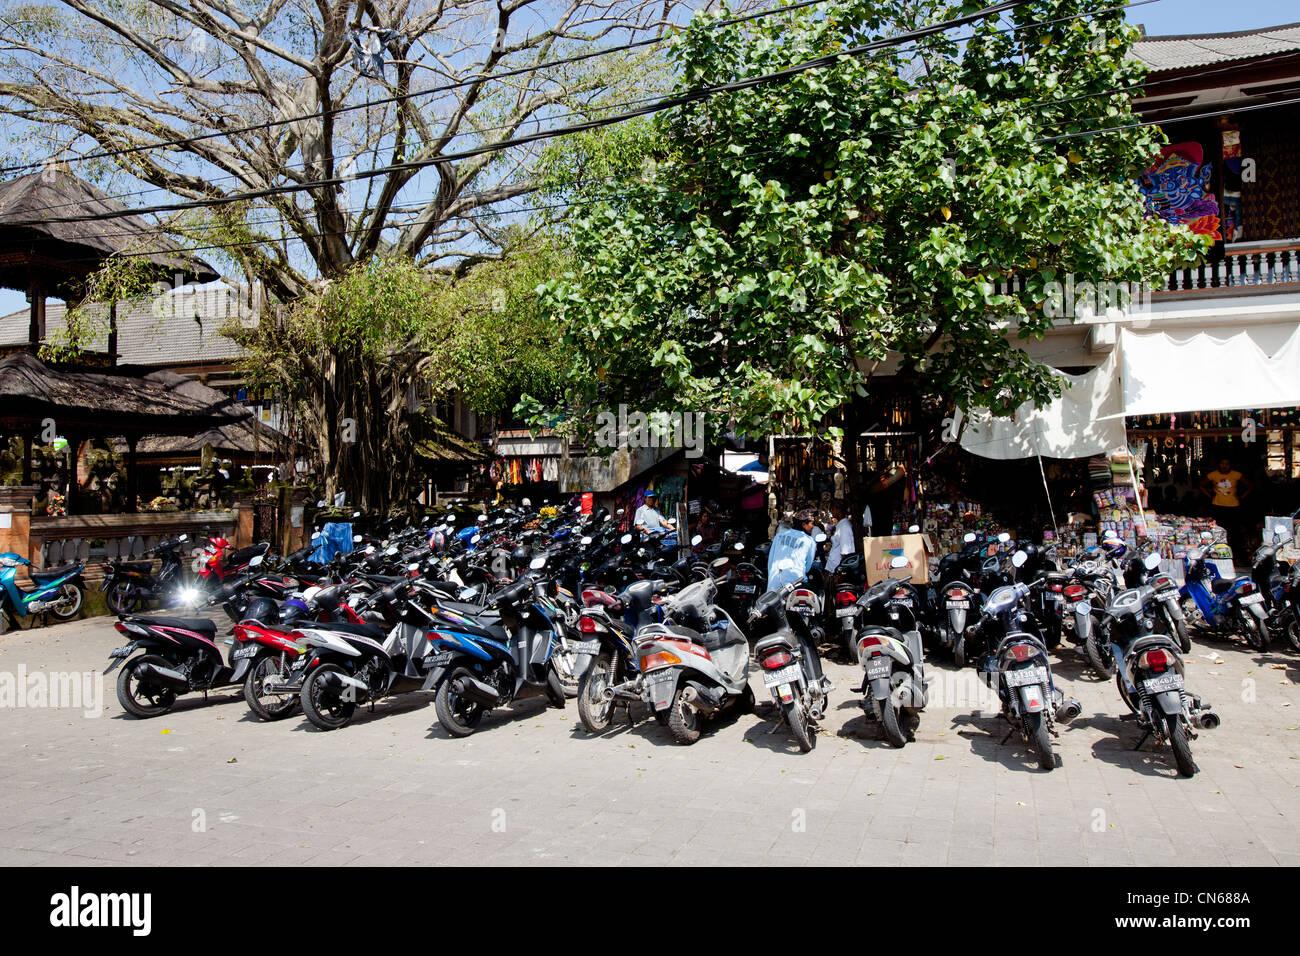 Motorbikes Bali Indonesia - Stock Image